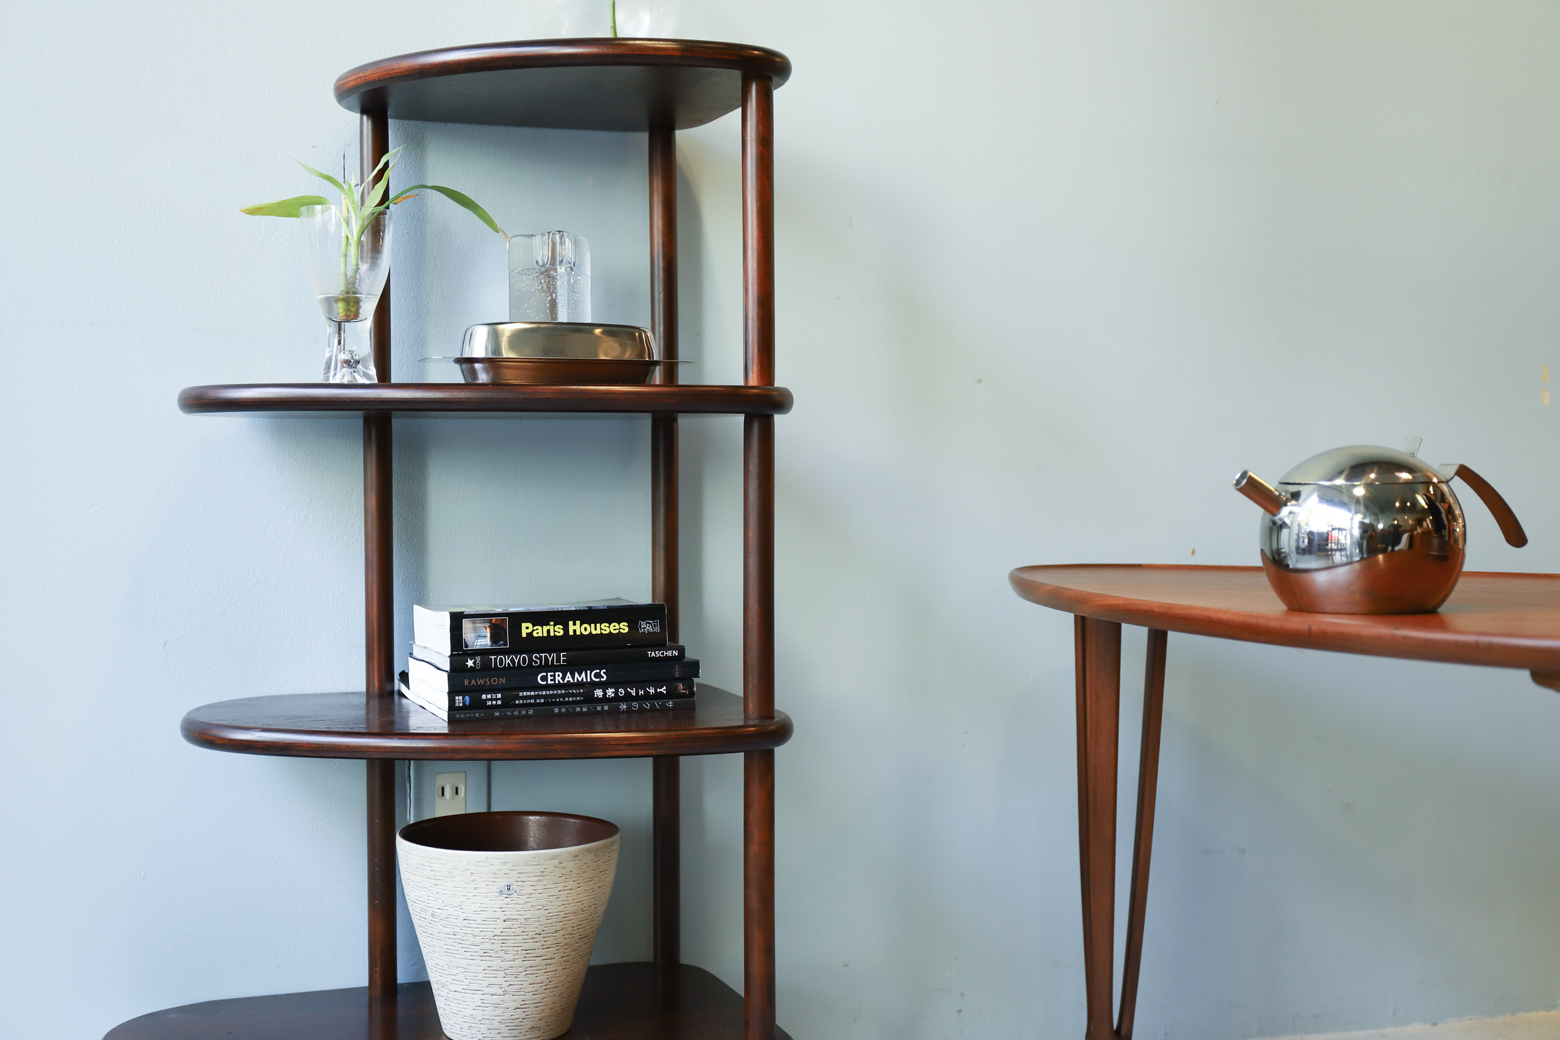 Retro Modern Wooden Corner Shelf/コーナーシェルフ ラック レトロ モダン 飾り棚